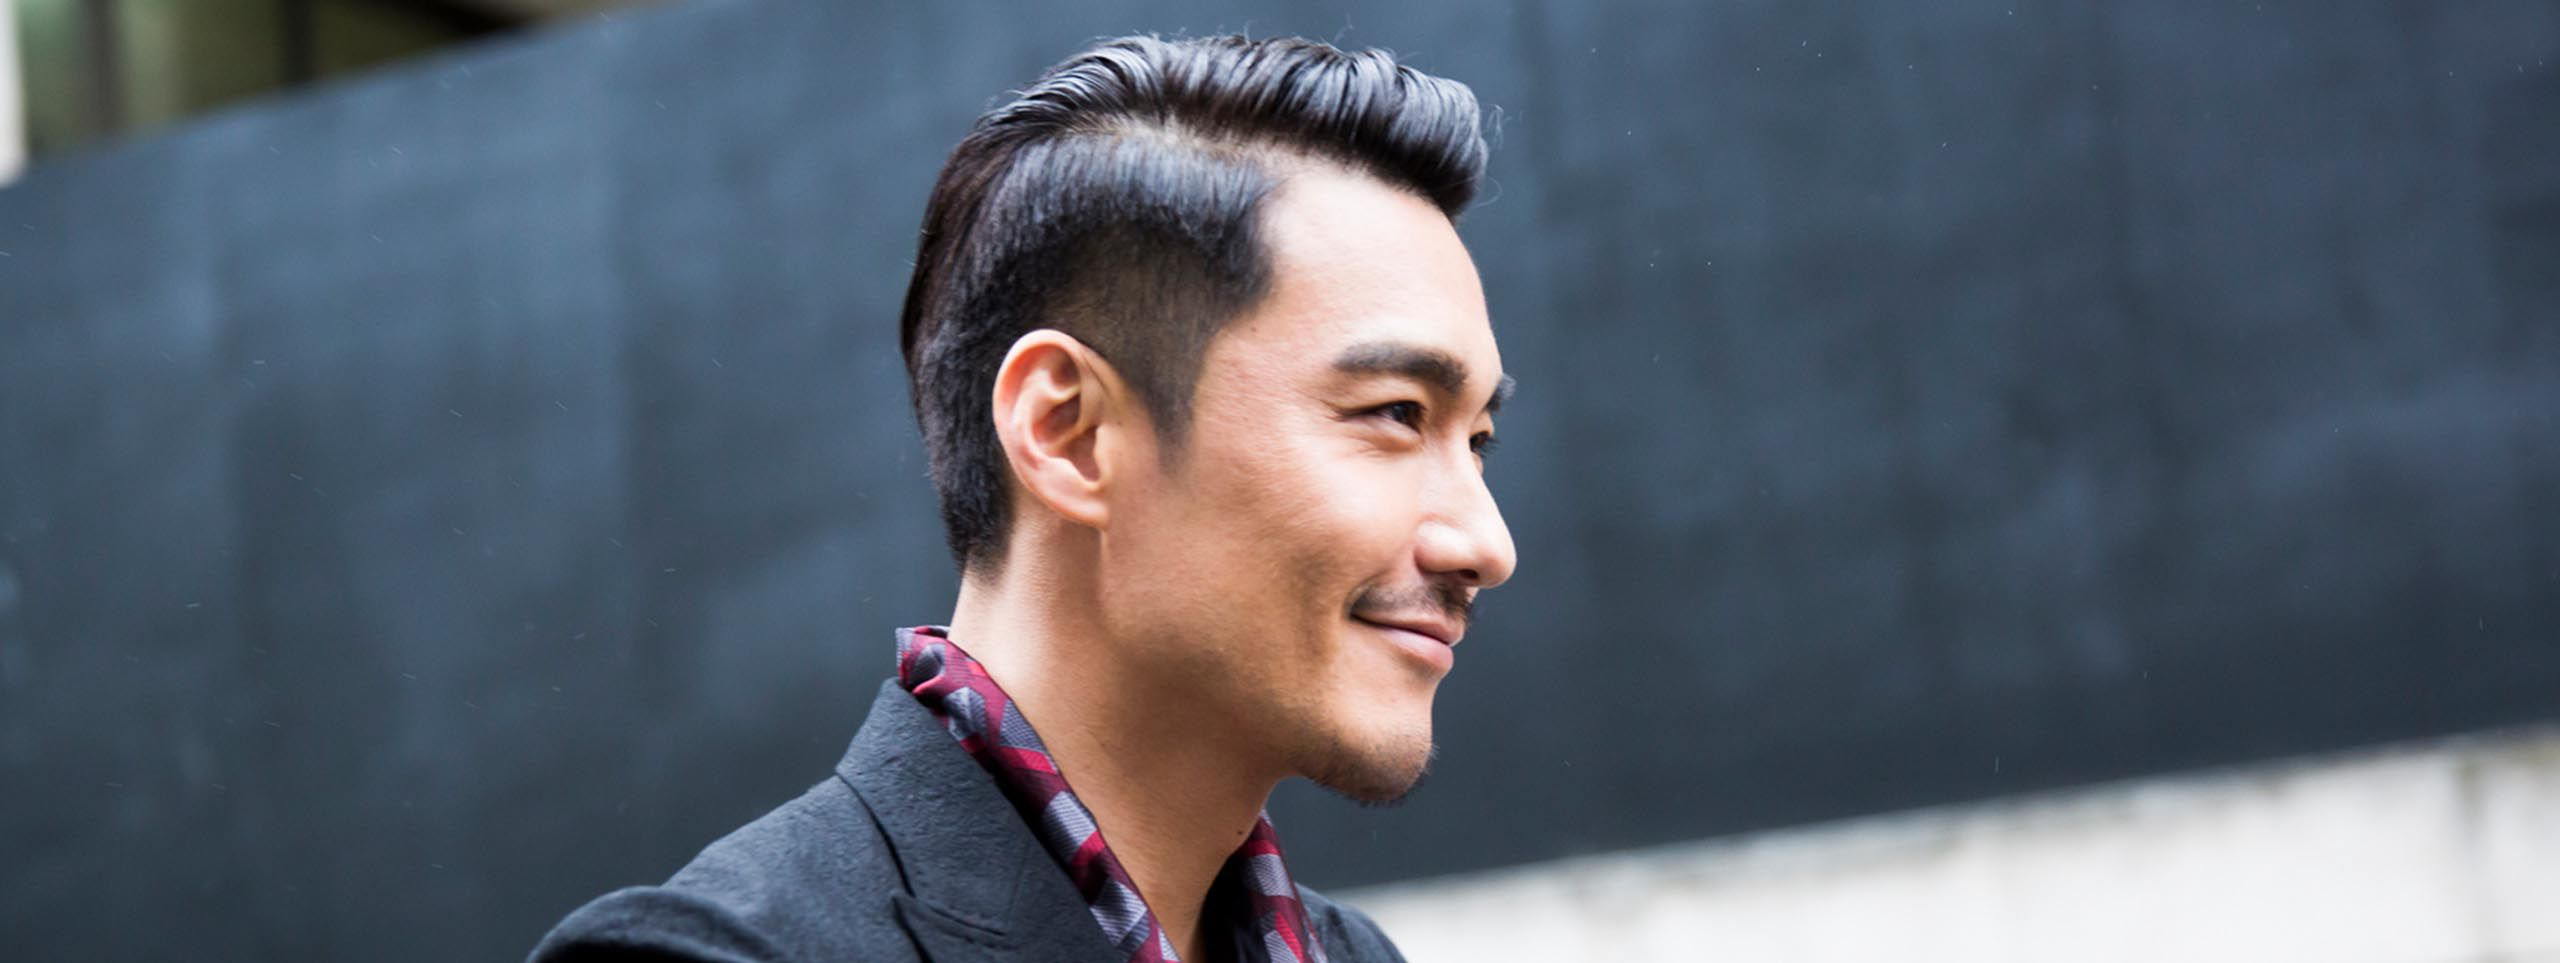 Muškarac sa sidecut frizurom